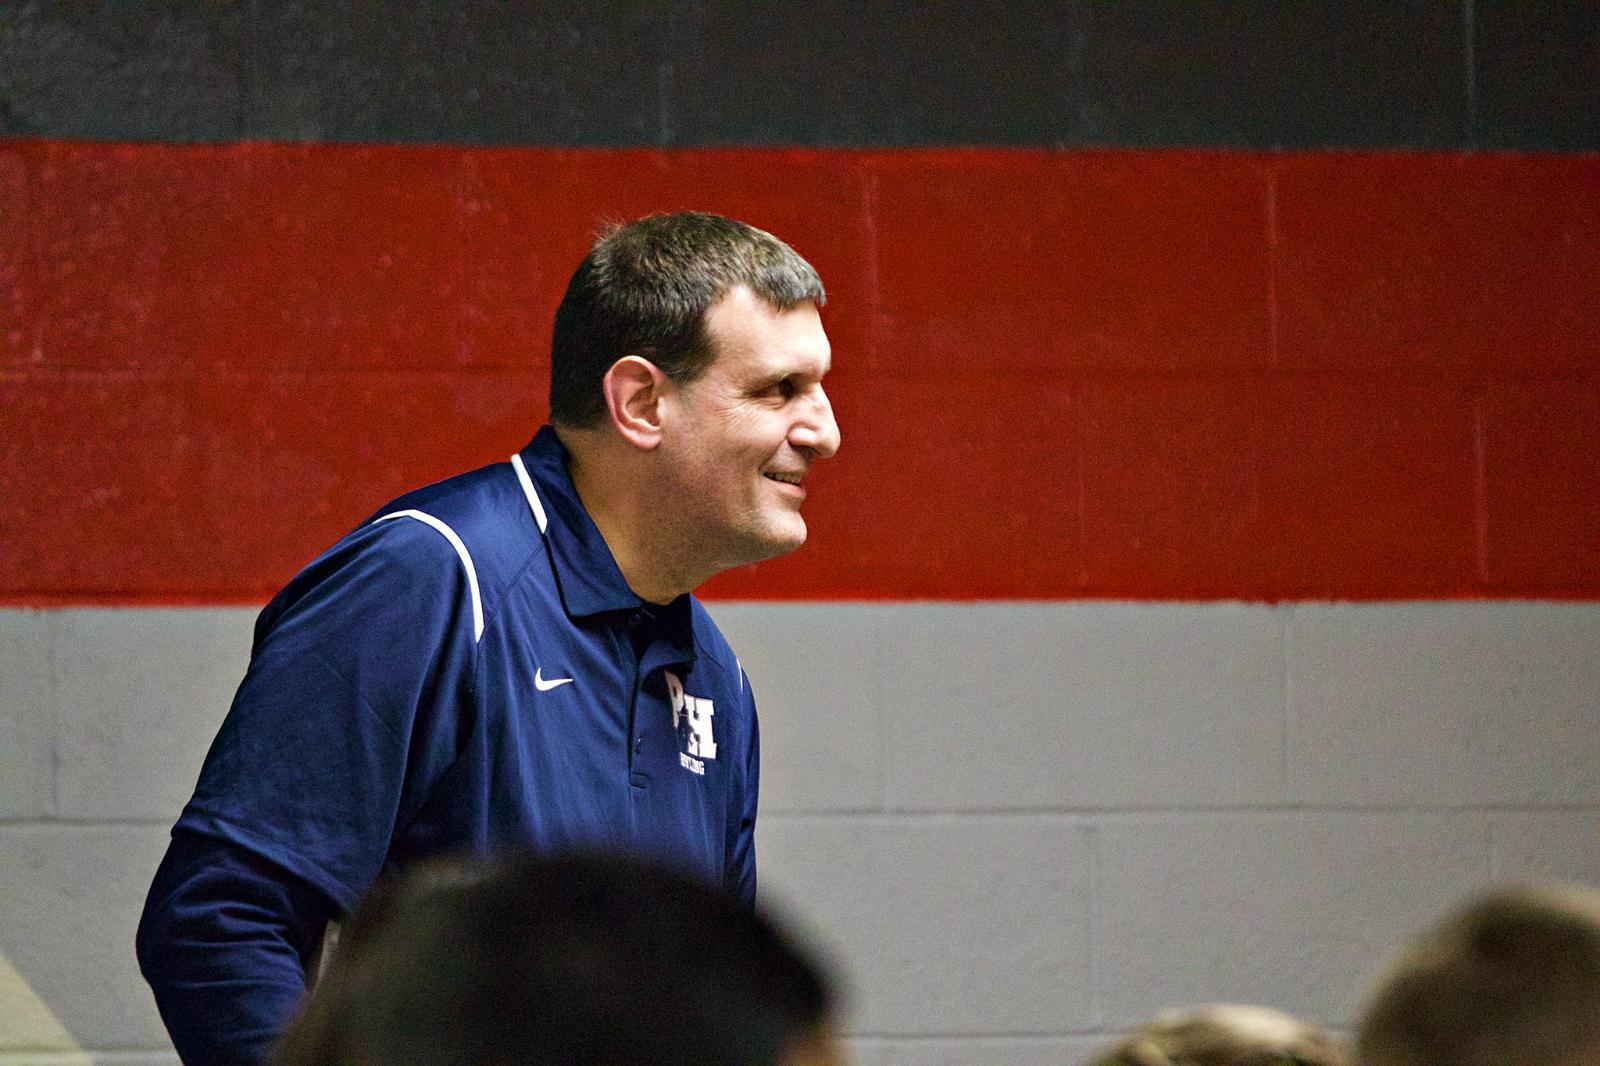 Deloy Johnson steps down as Bowling Coach